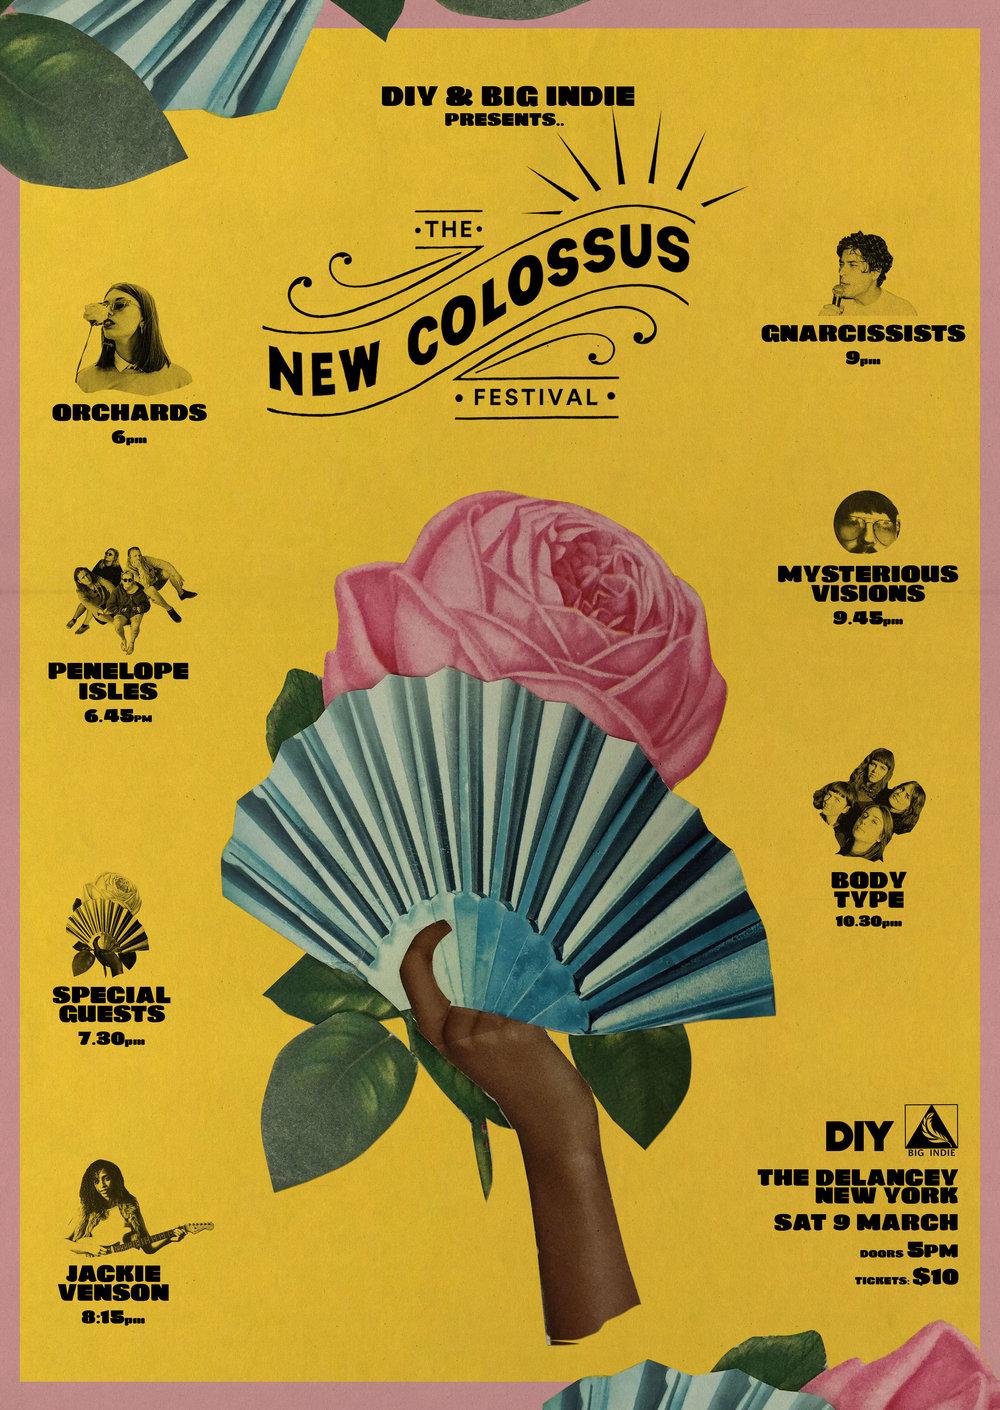 New-Colossus-Festival-_DIY.jpg